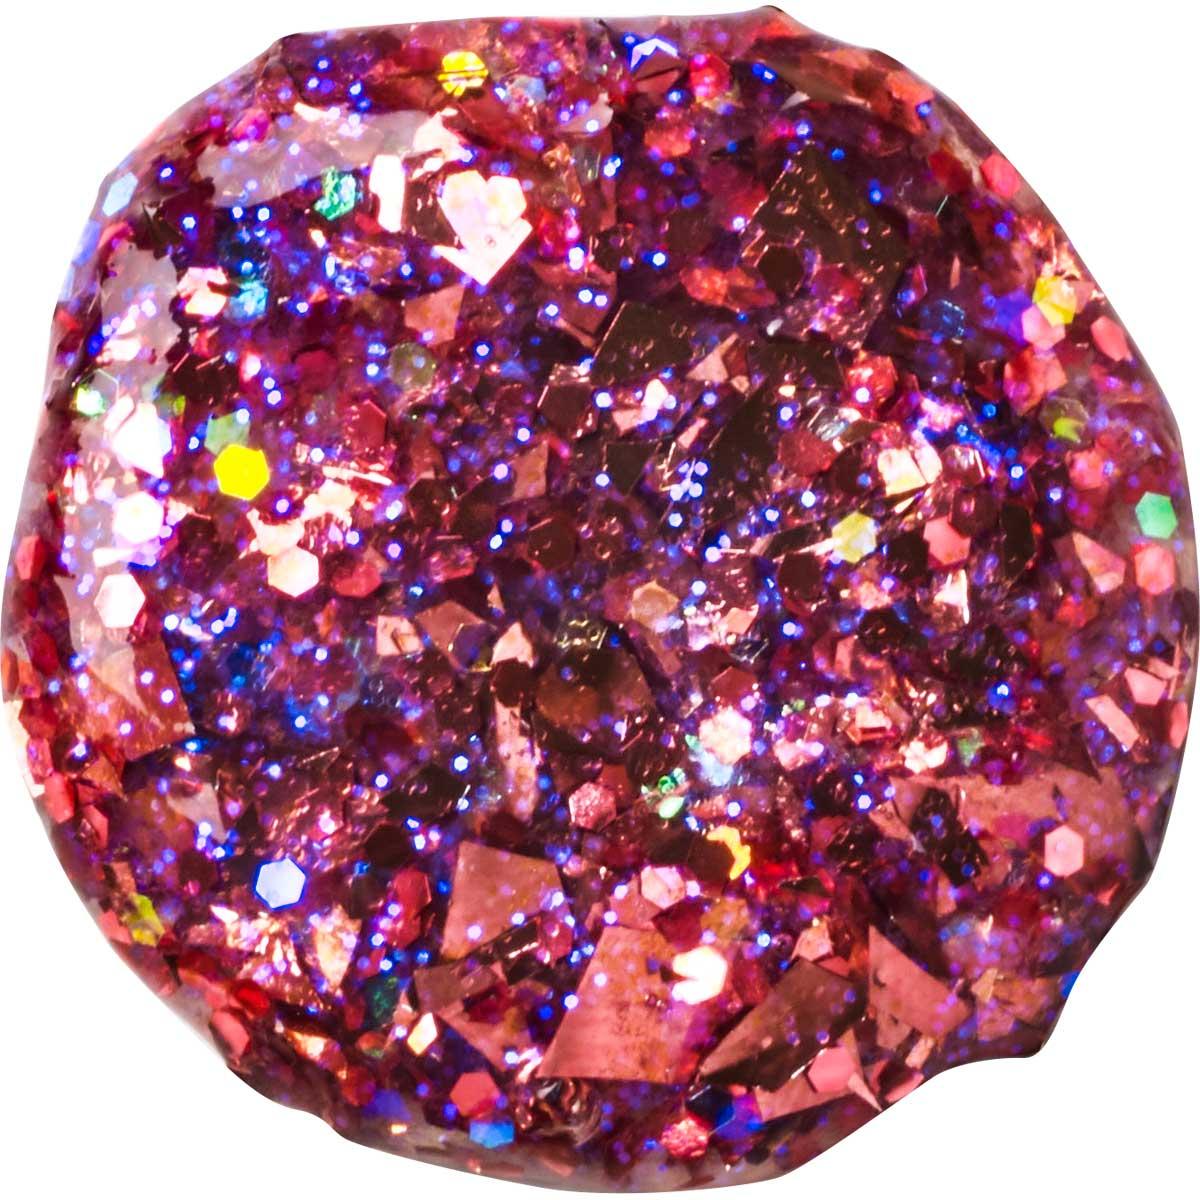 FolkArt ® Glitterific™ Acrylic Paint - Hot Pink, 2 oz. - 5879